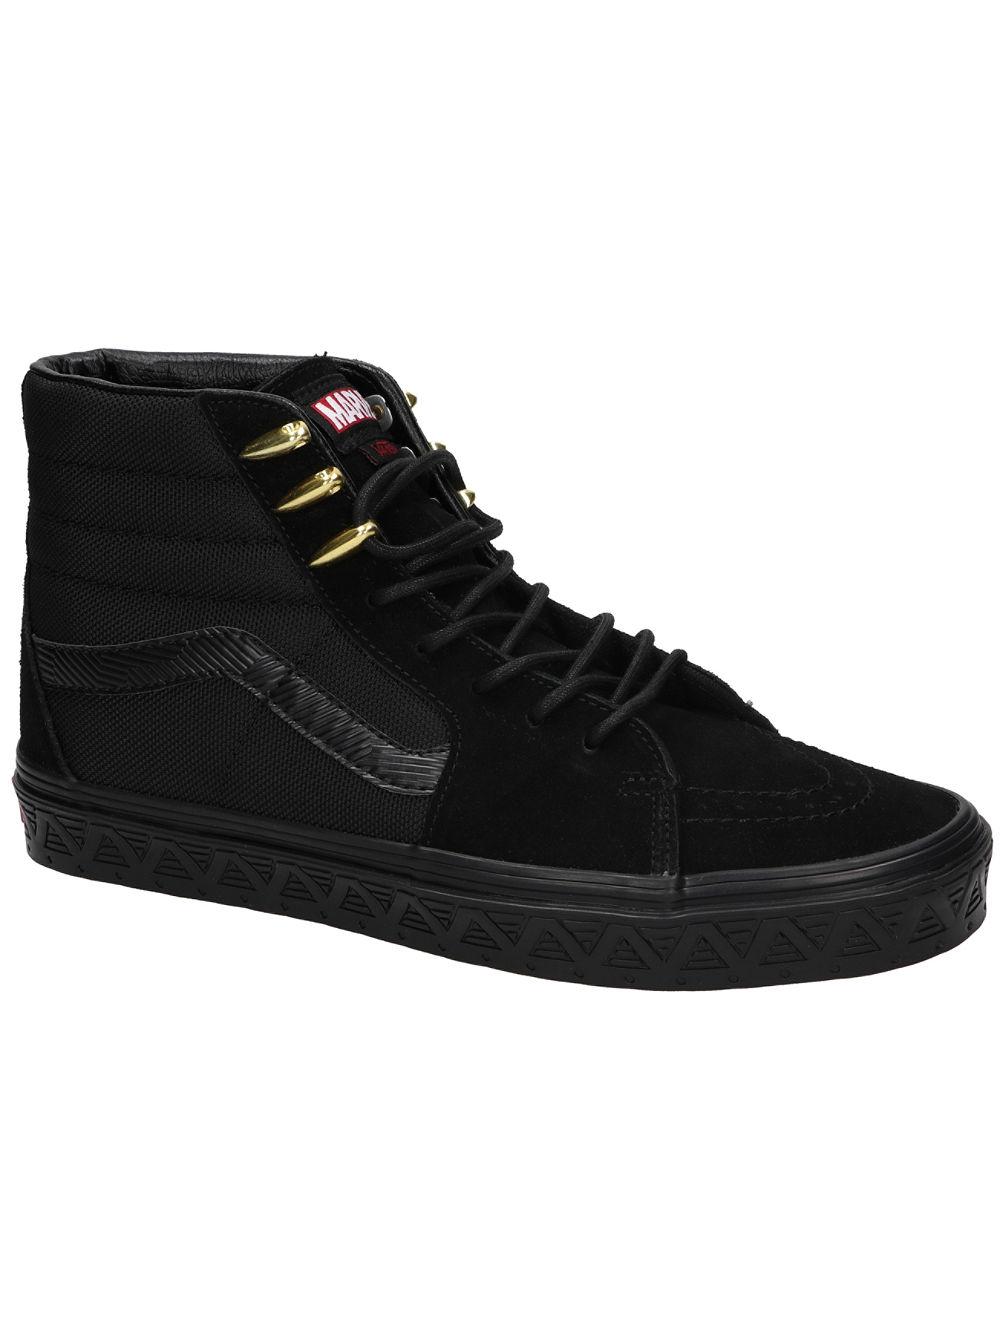 2523c1cd3ce12 Marvel Sk8-Hi Sneakers